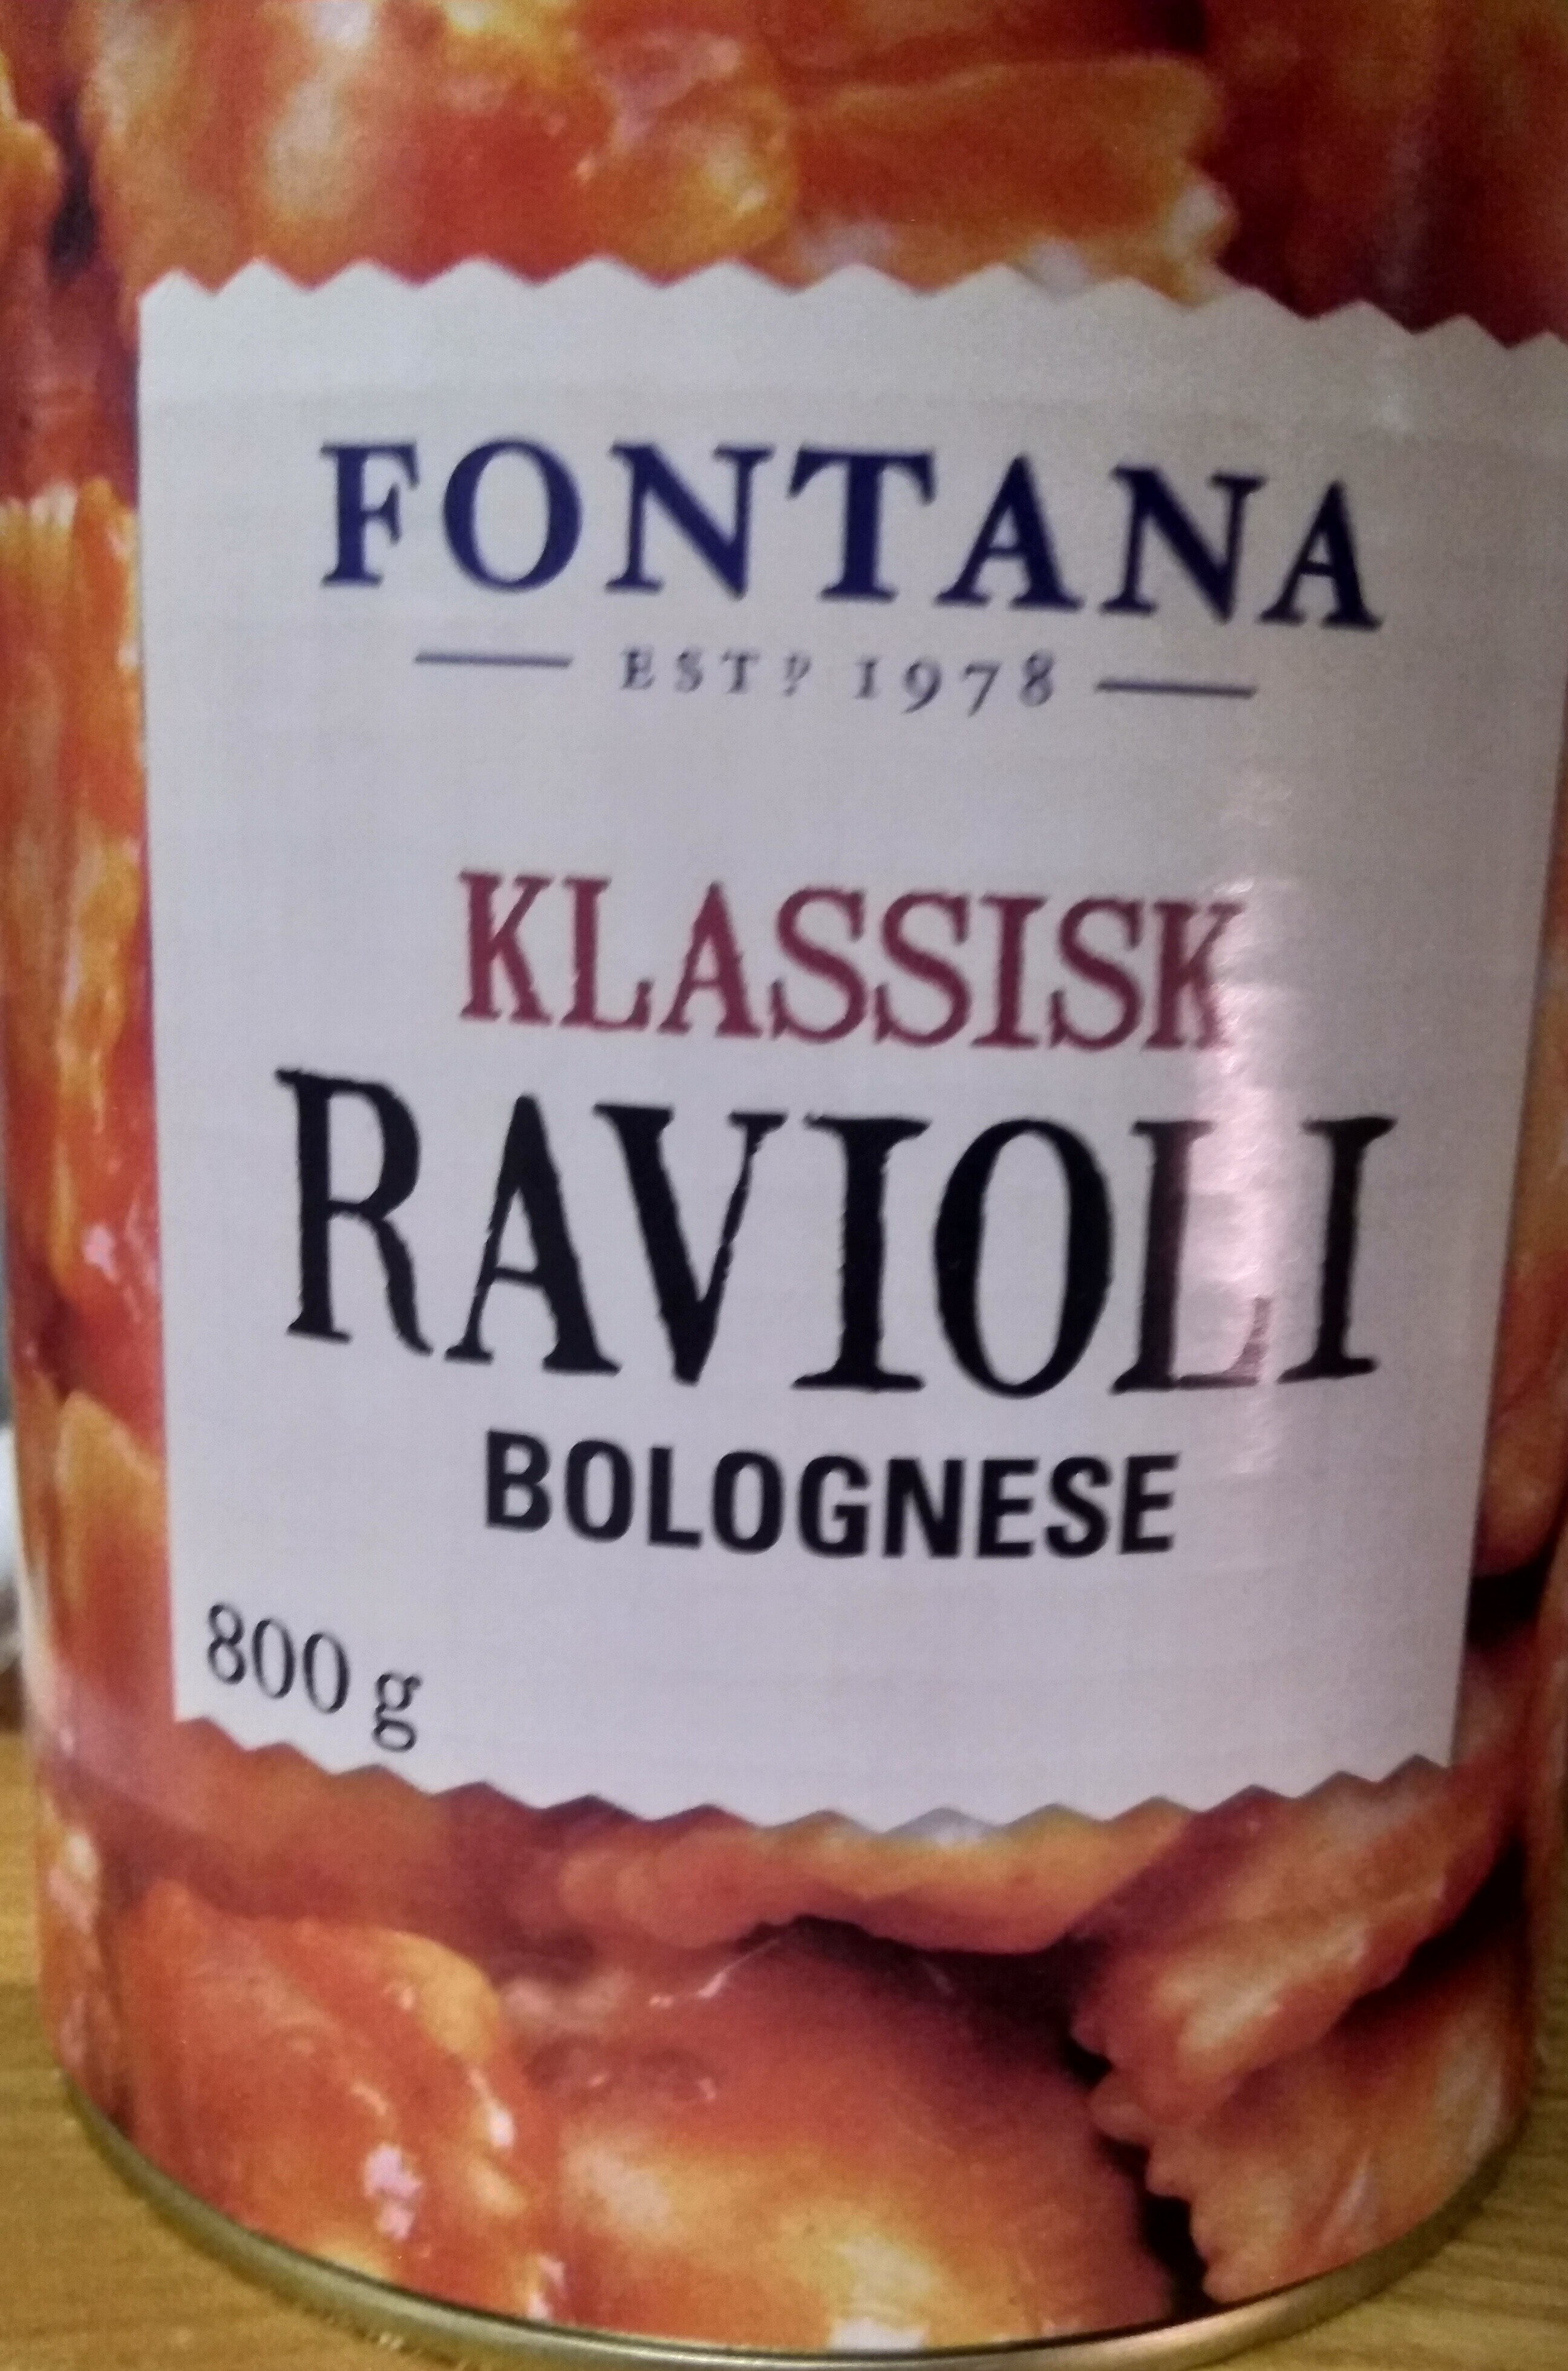 Klassisk RAVIOLI - Product - fi